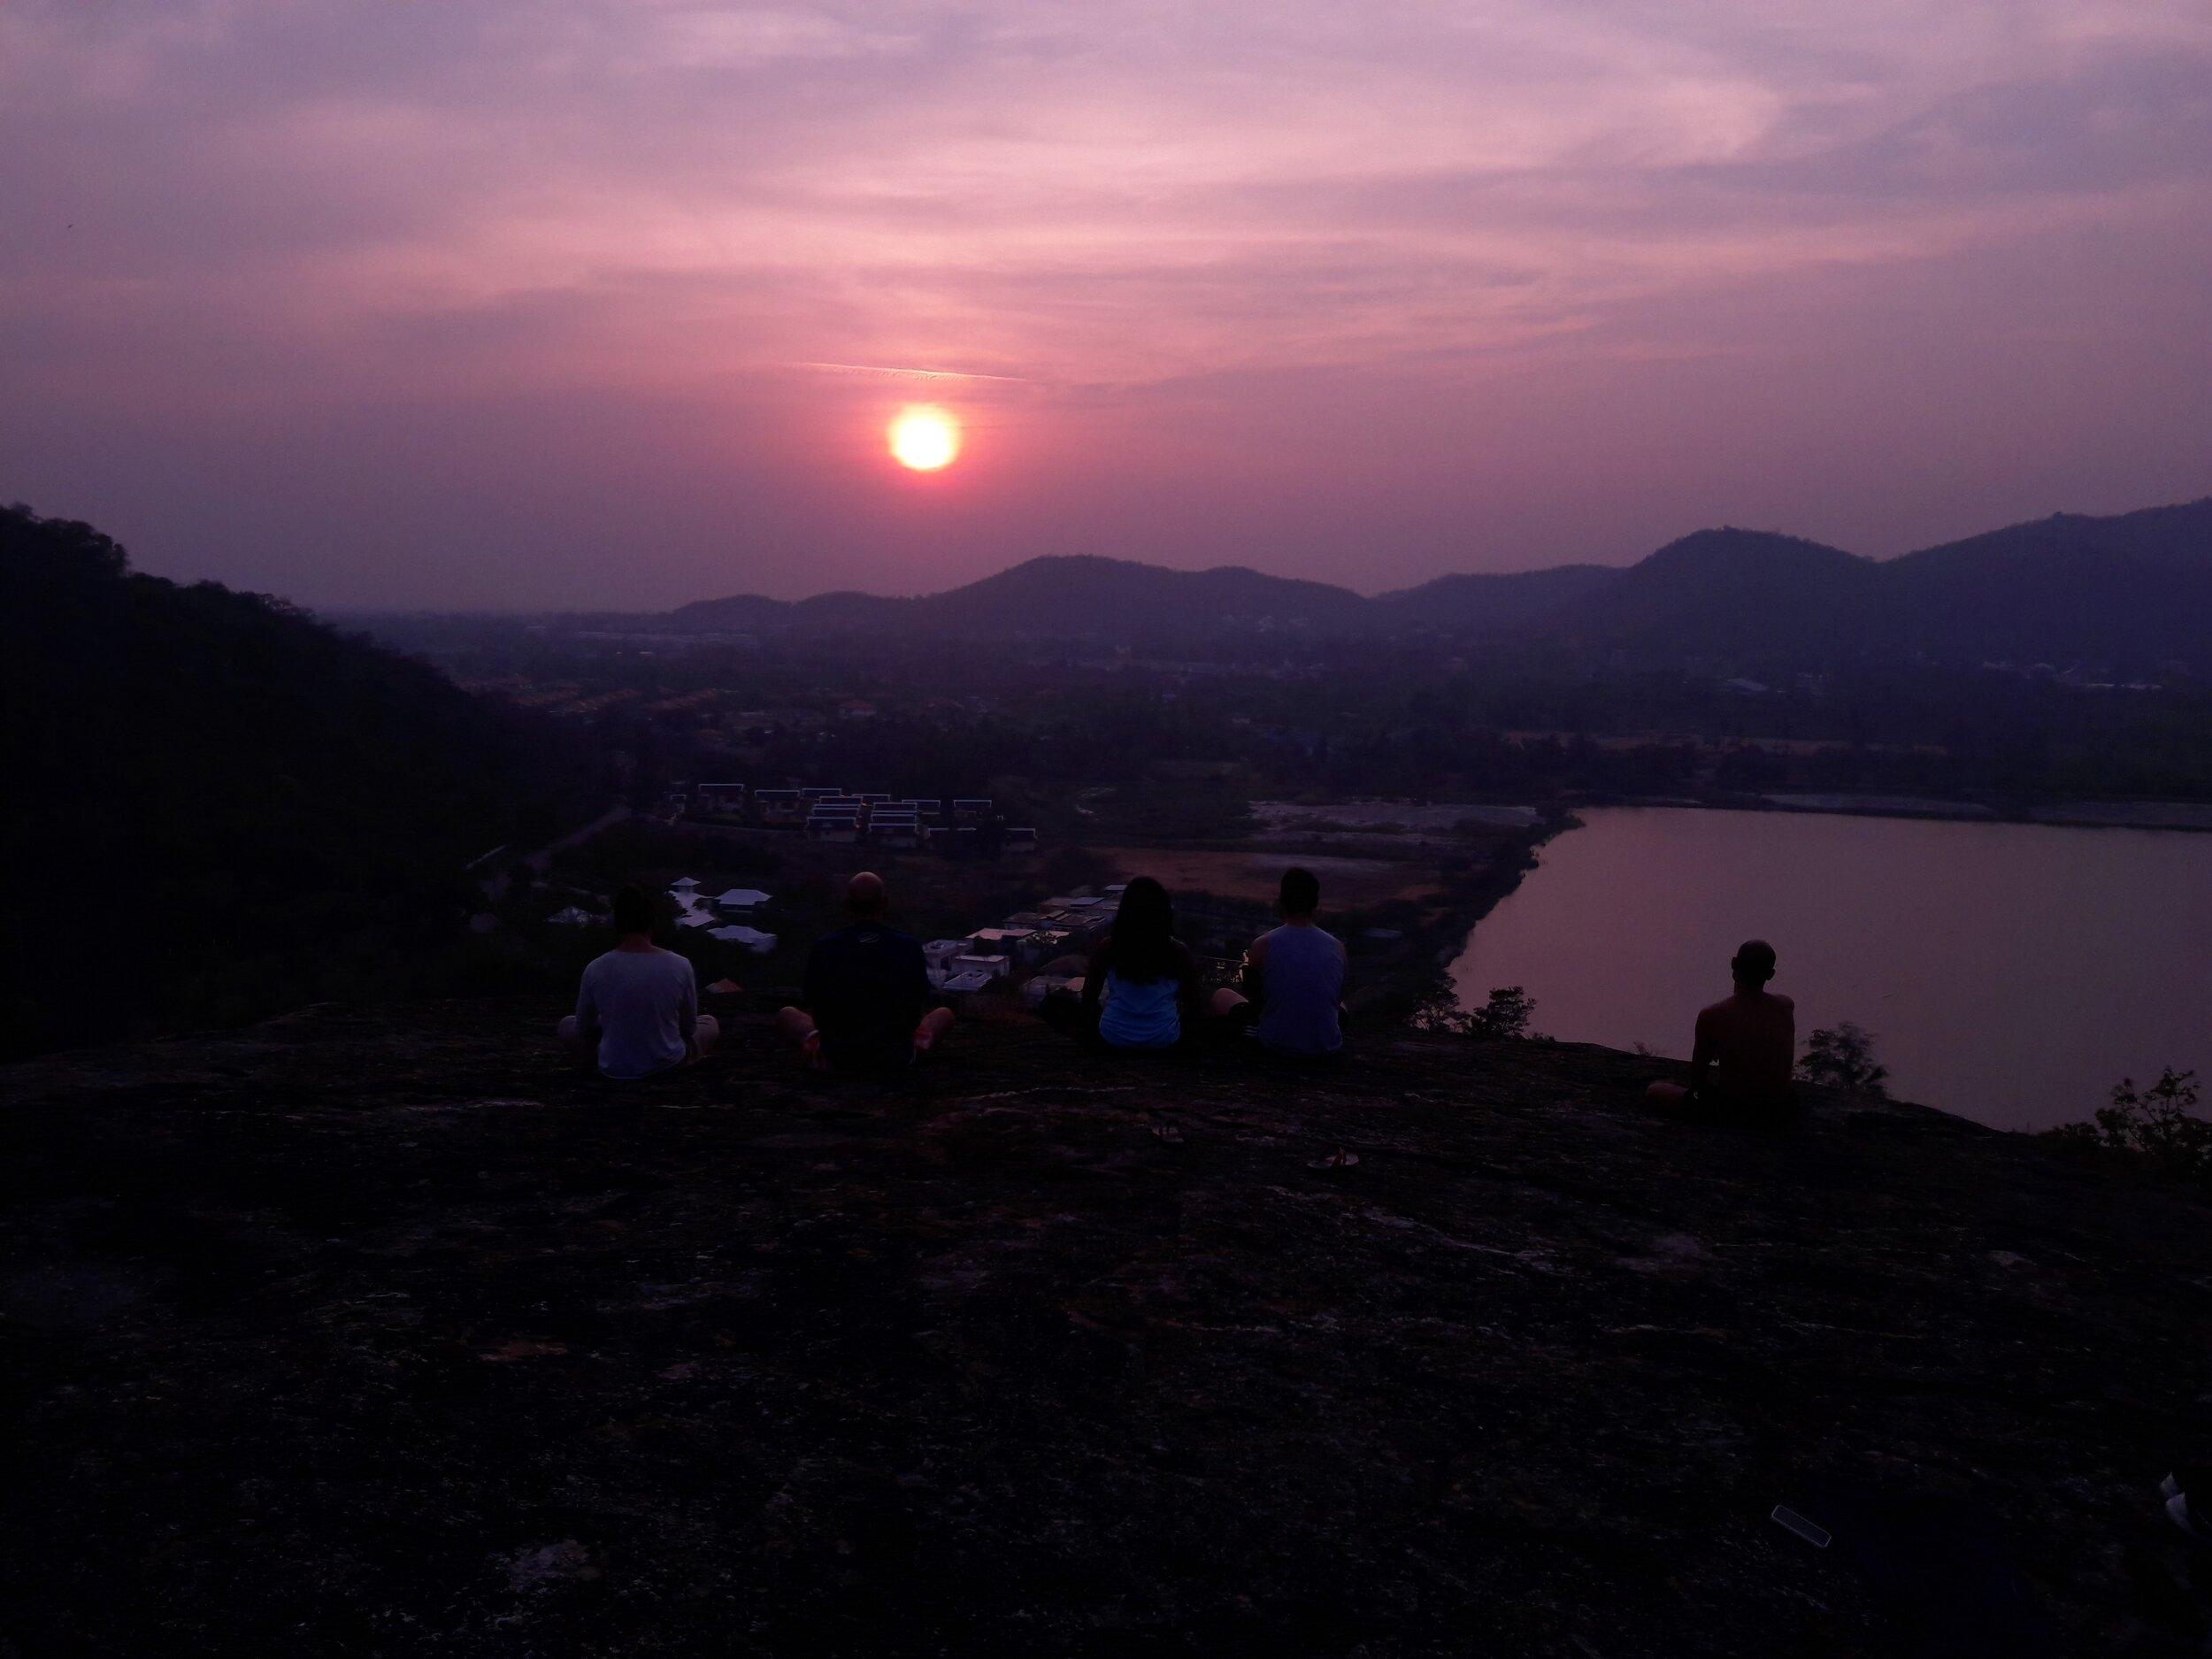 olive retreat sunset meditation mountain.jpg